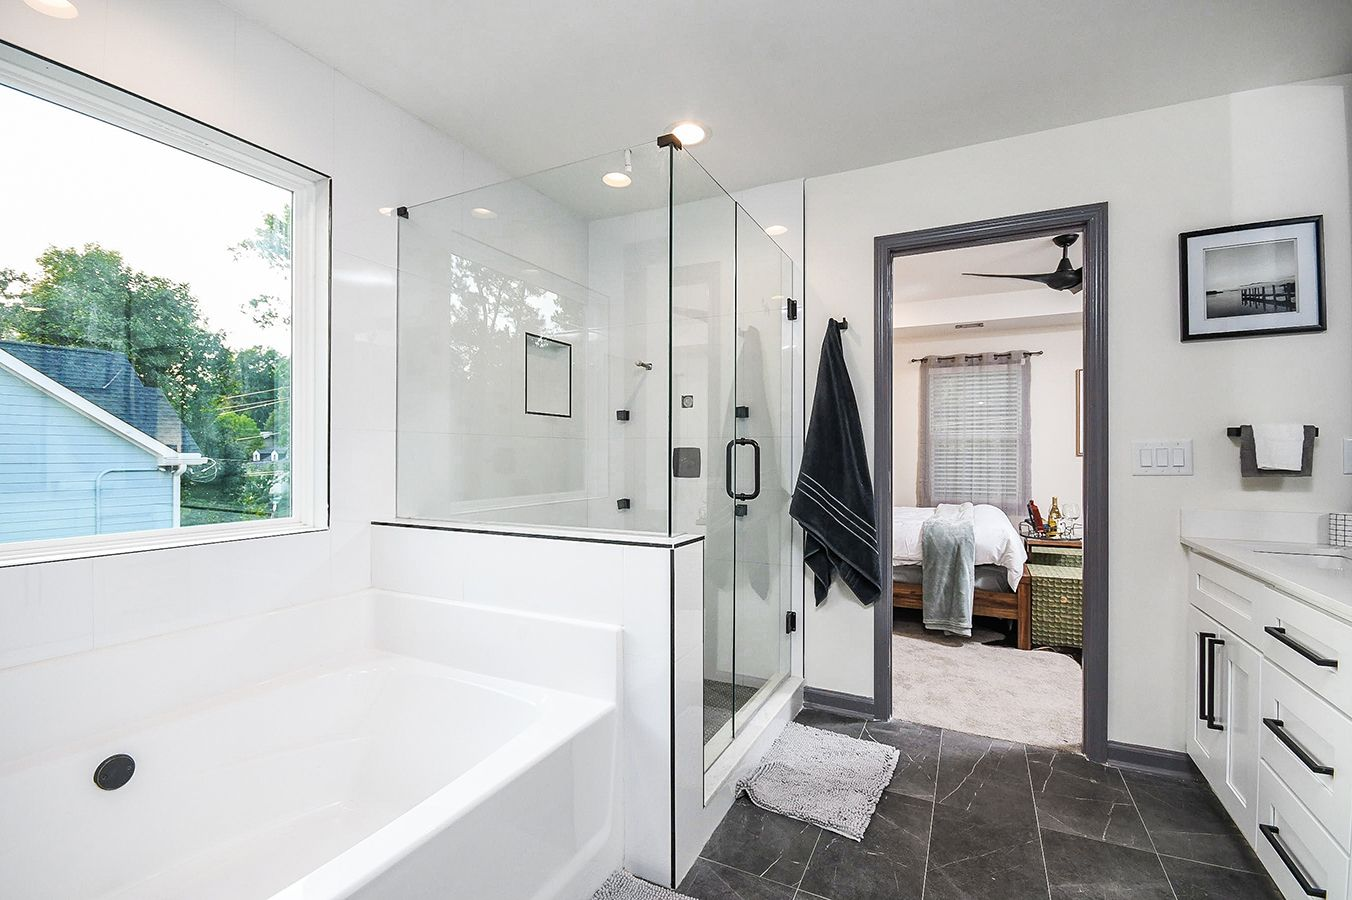 Upper_Level_Master_Bathroom_view7.jpg